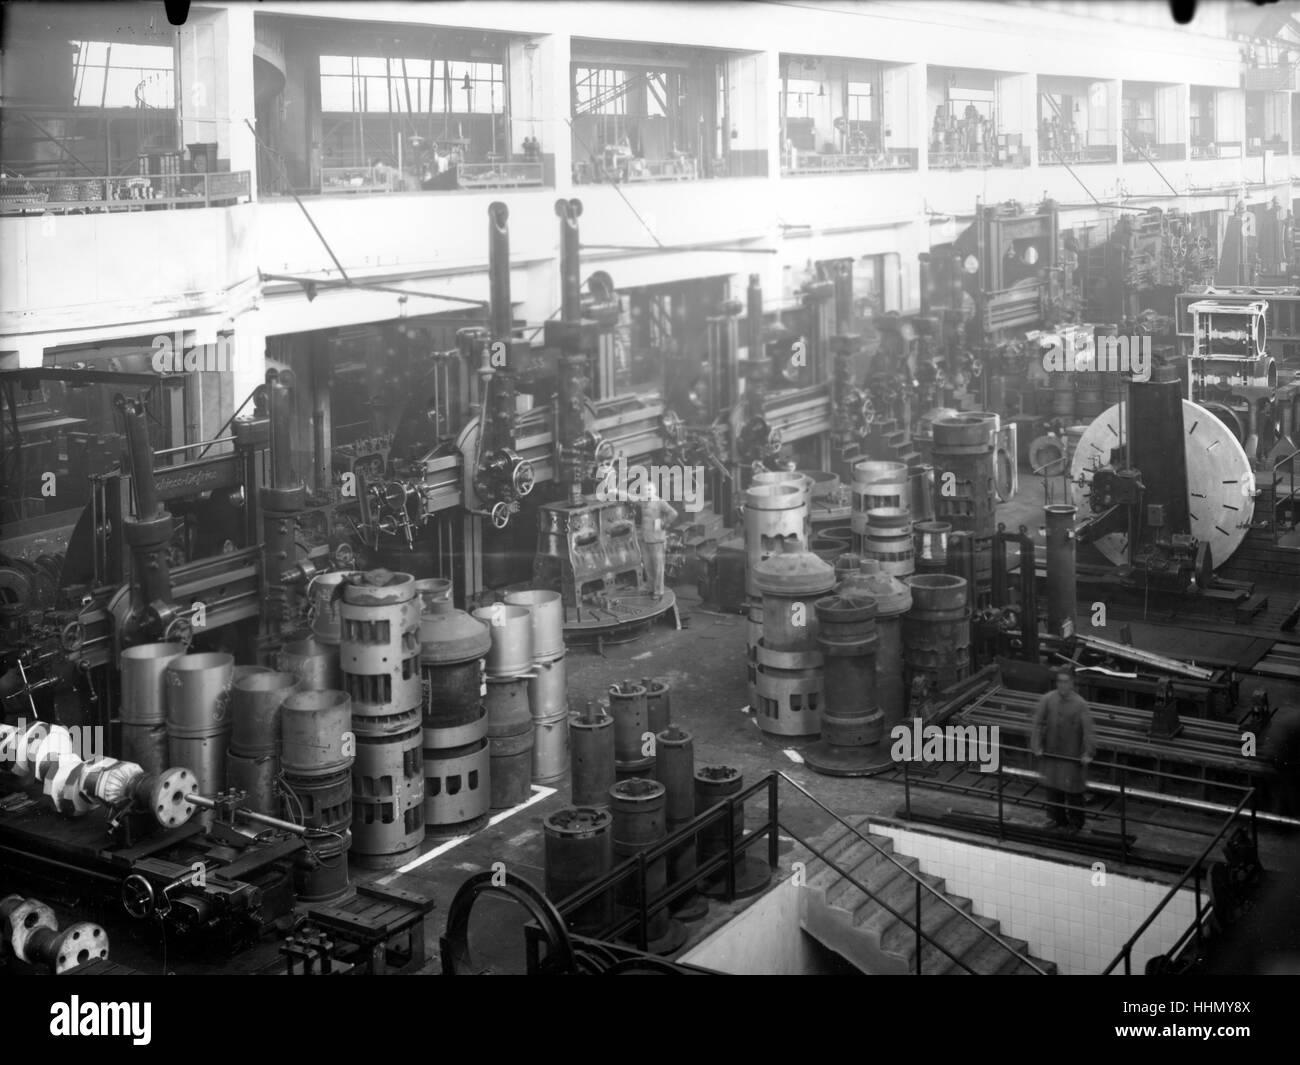 1930 - 40. Fiat - Ansaldo grande fabbrica di motori in Genova San Pier d'Arena, sanpierdarena. Foto Stock